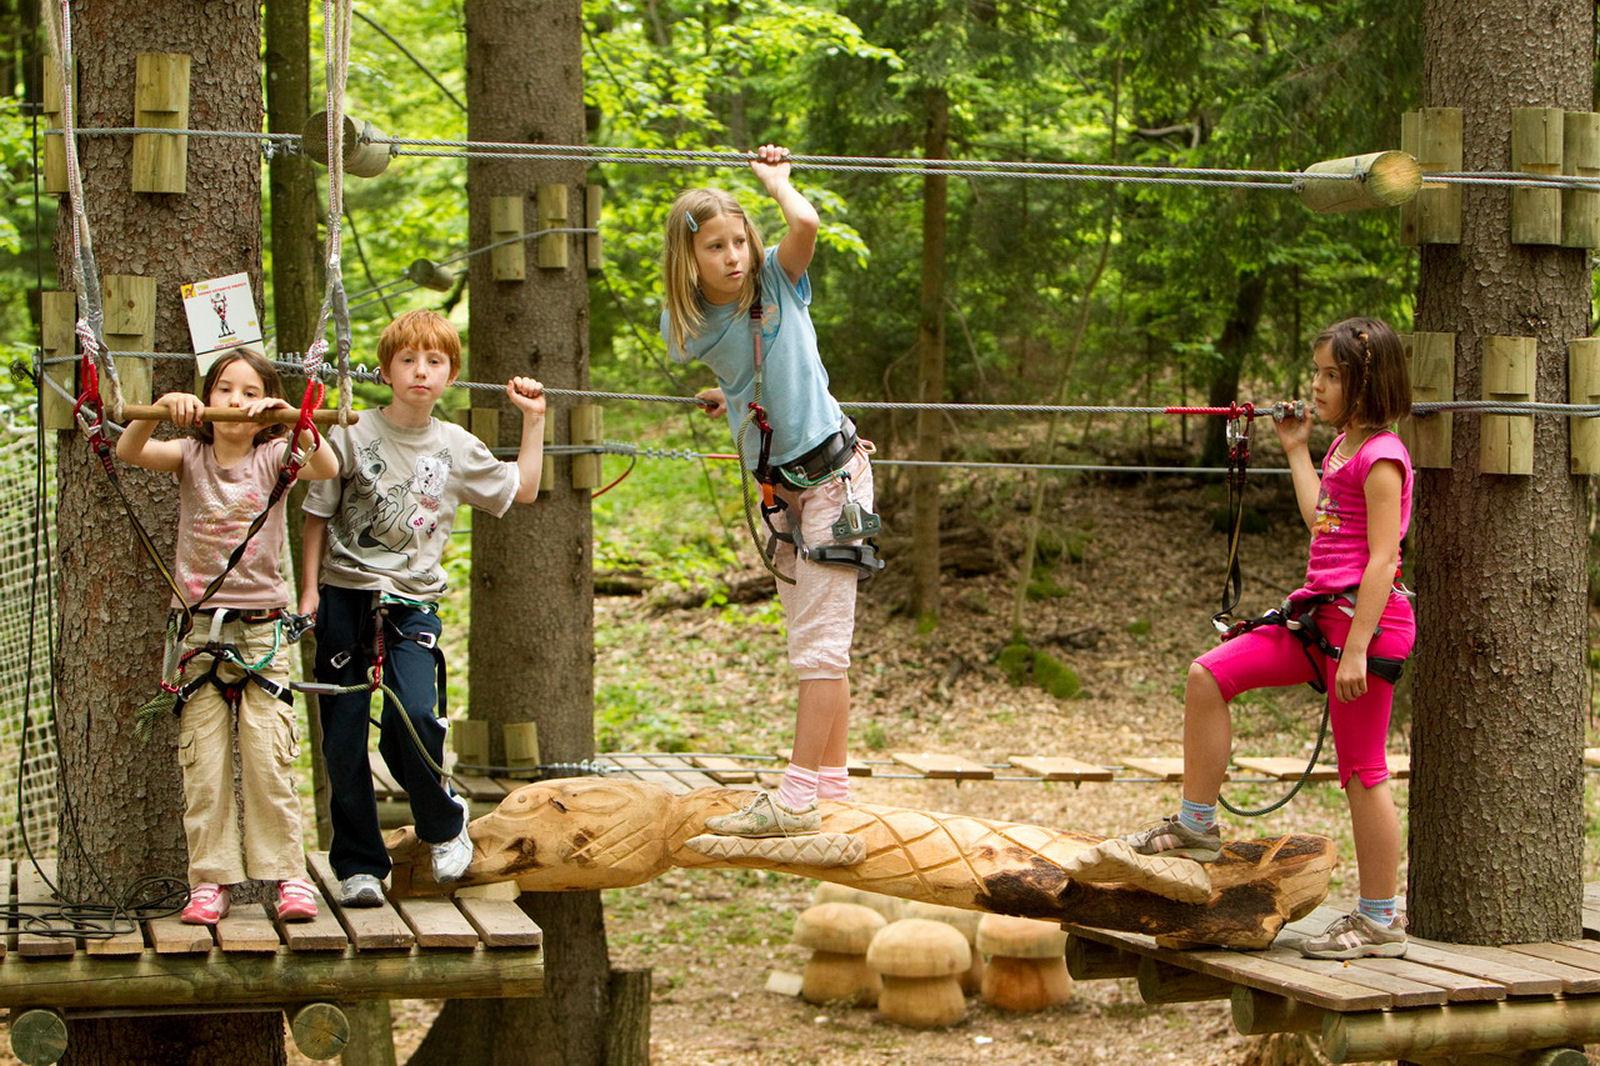 adventure-park-bled-02-slovenia